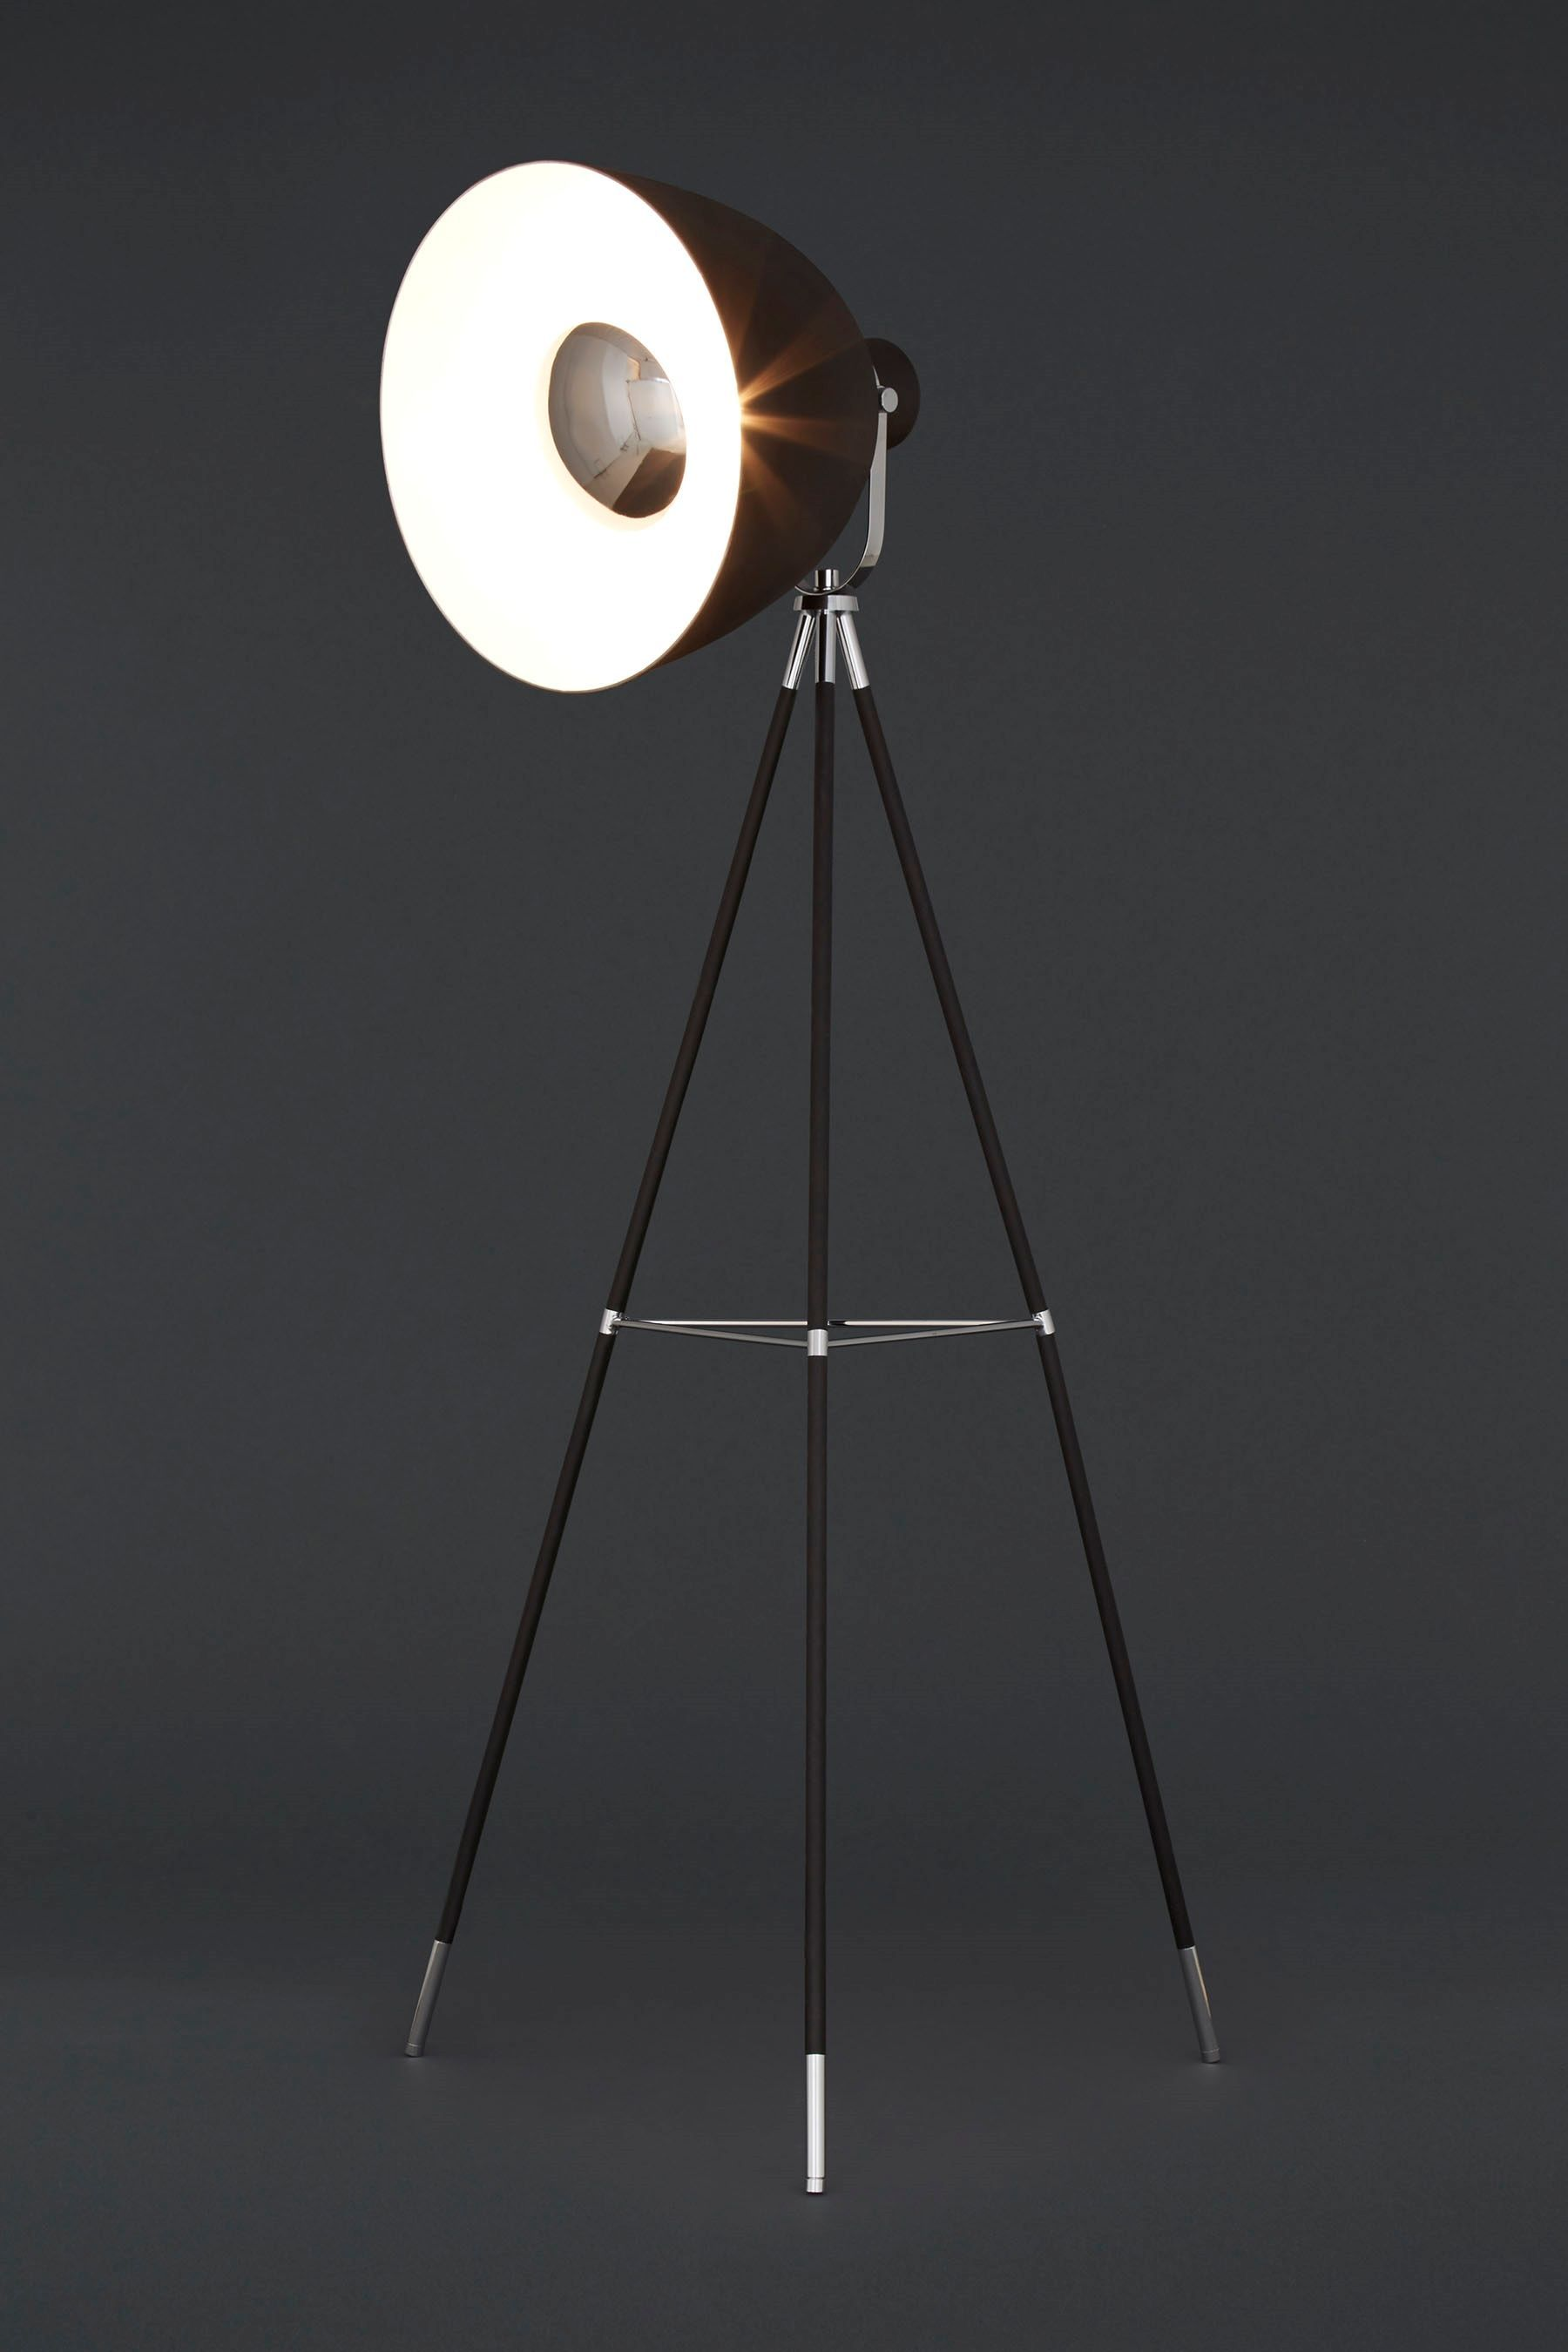 Buy studio black and chrome tripod floor lamp from the next uk buy studio black and chrome tripod floor lamp from the next uk online shop aloadofball Images